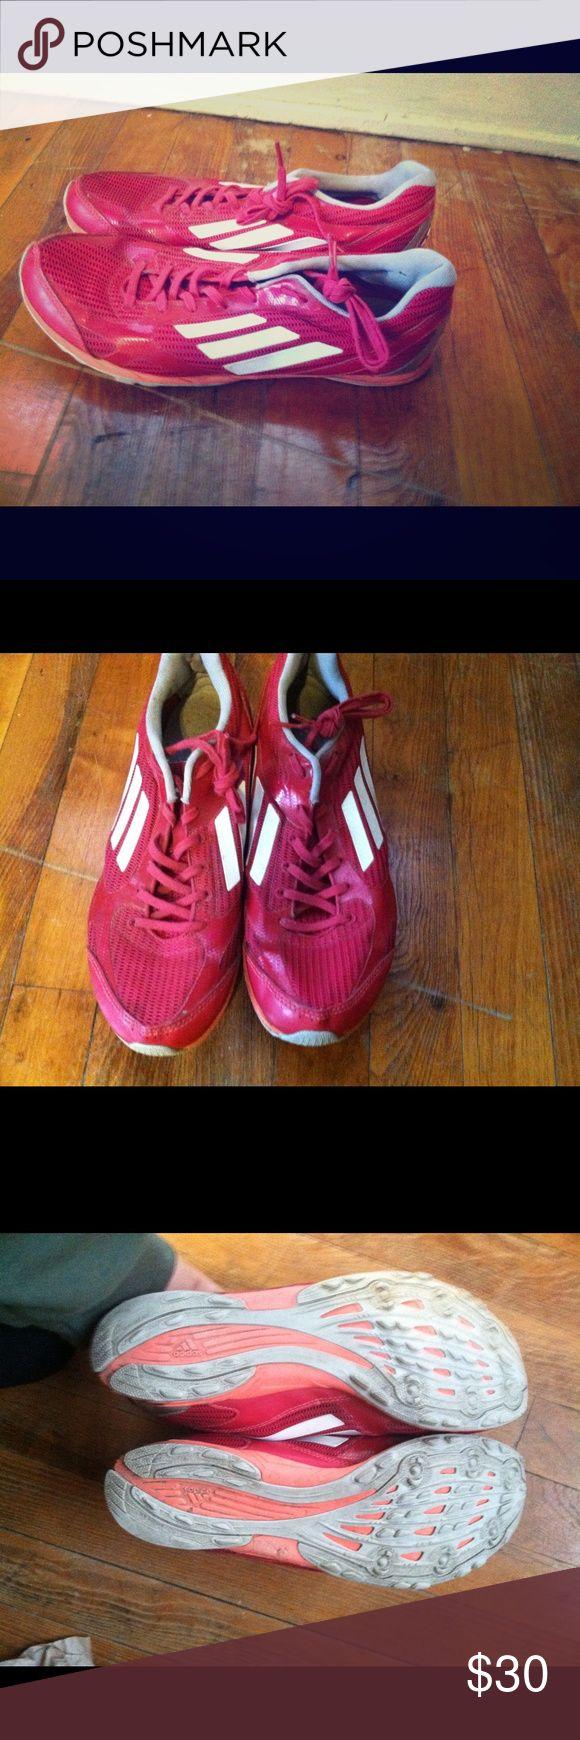 Adidas Adizero Racing Flats - DONATING SOON Lightly worn running shoes. Lightweight, mesh upper, neutral running shoe. Adidas Shoes Athletic Shoes